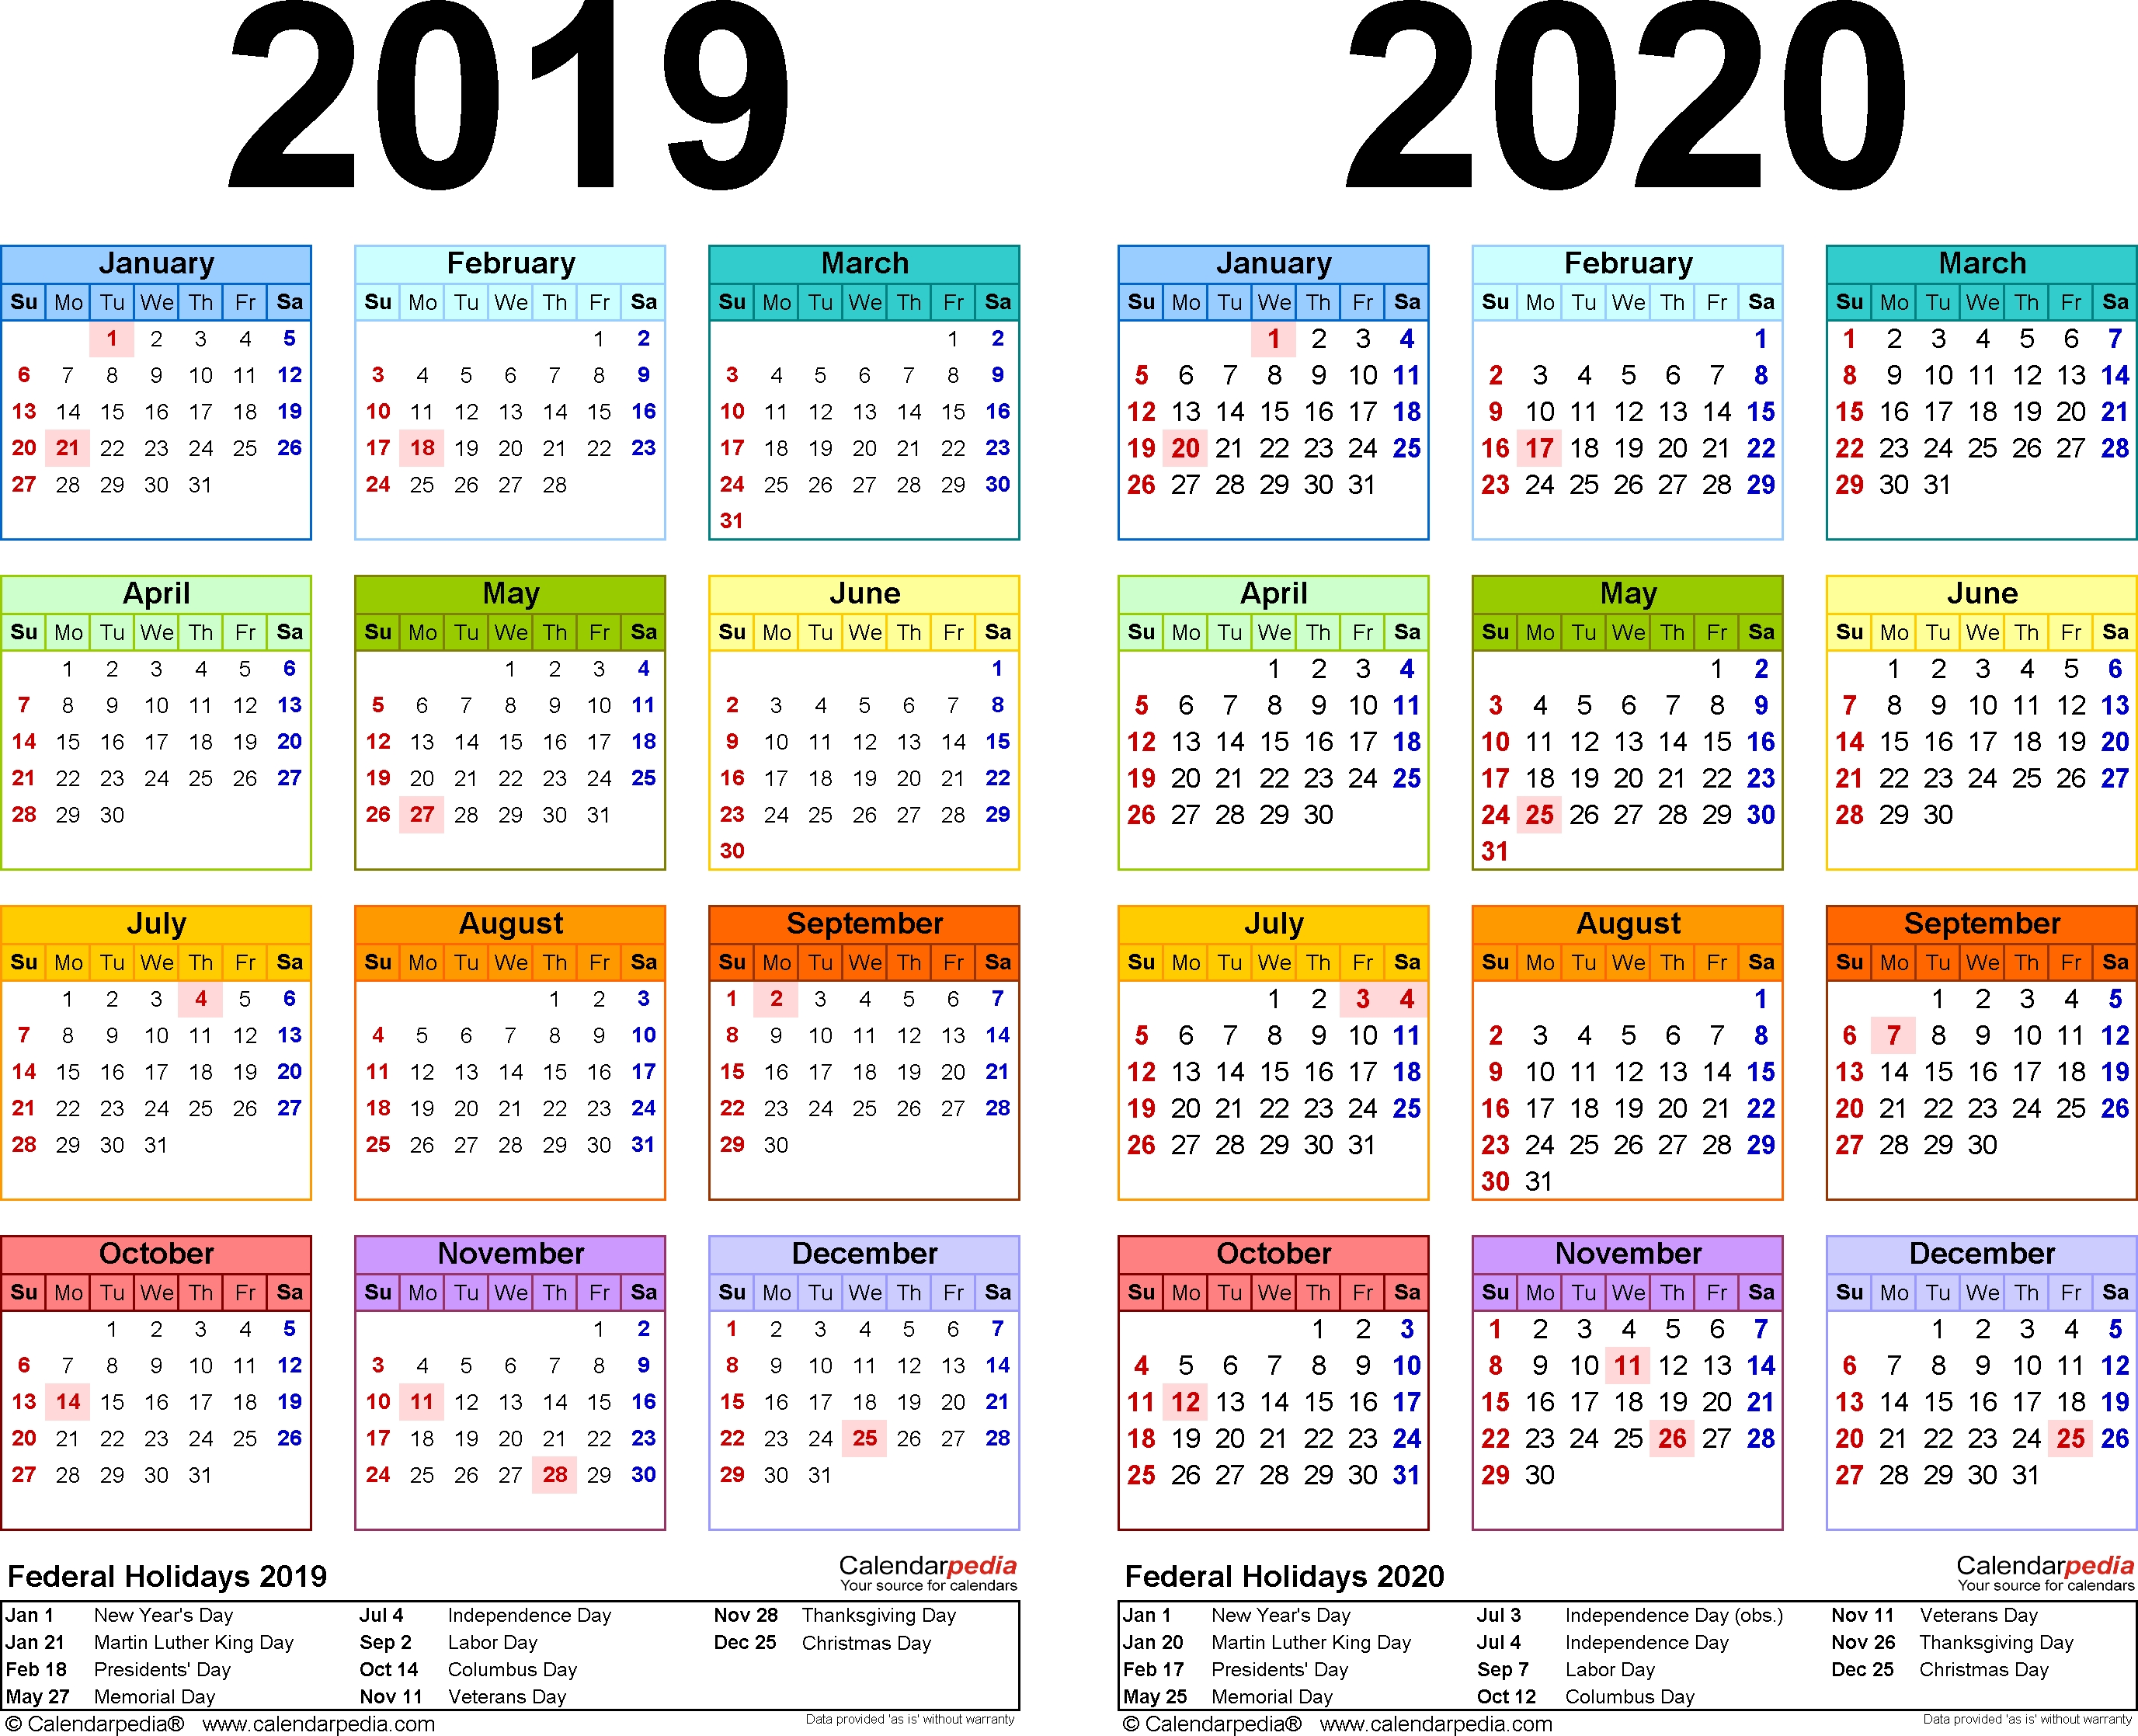 2019-2020 Calendar - Free Printable Two-Year Pdf Calendars pertaining to Year Long Calendar For 2019-2020 Printable